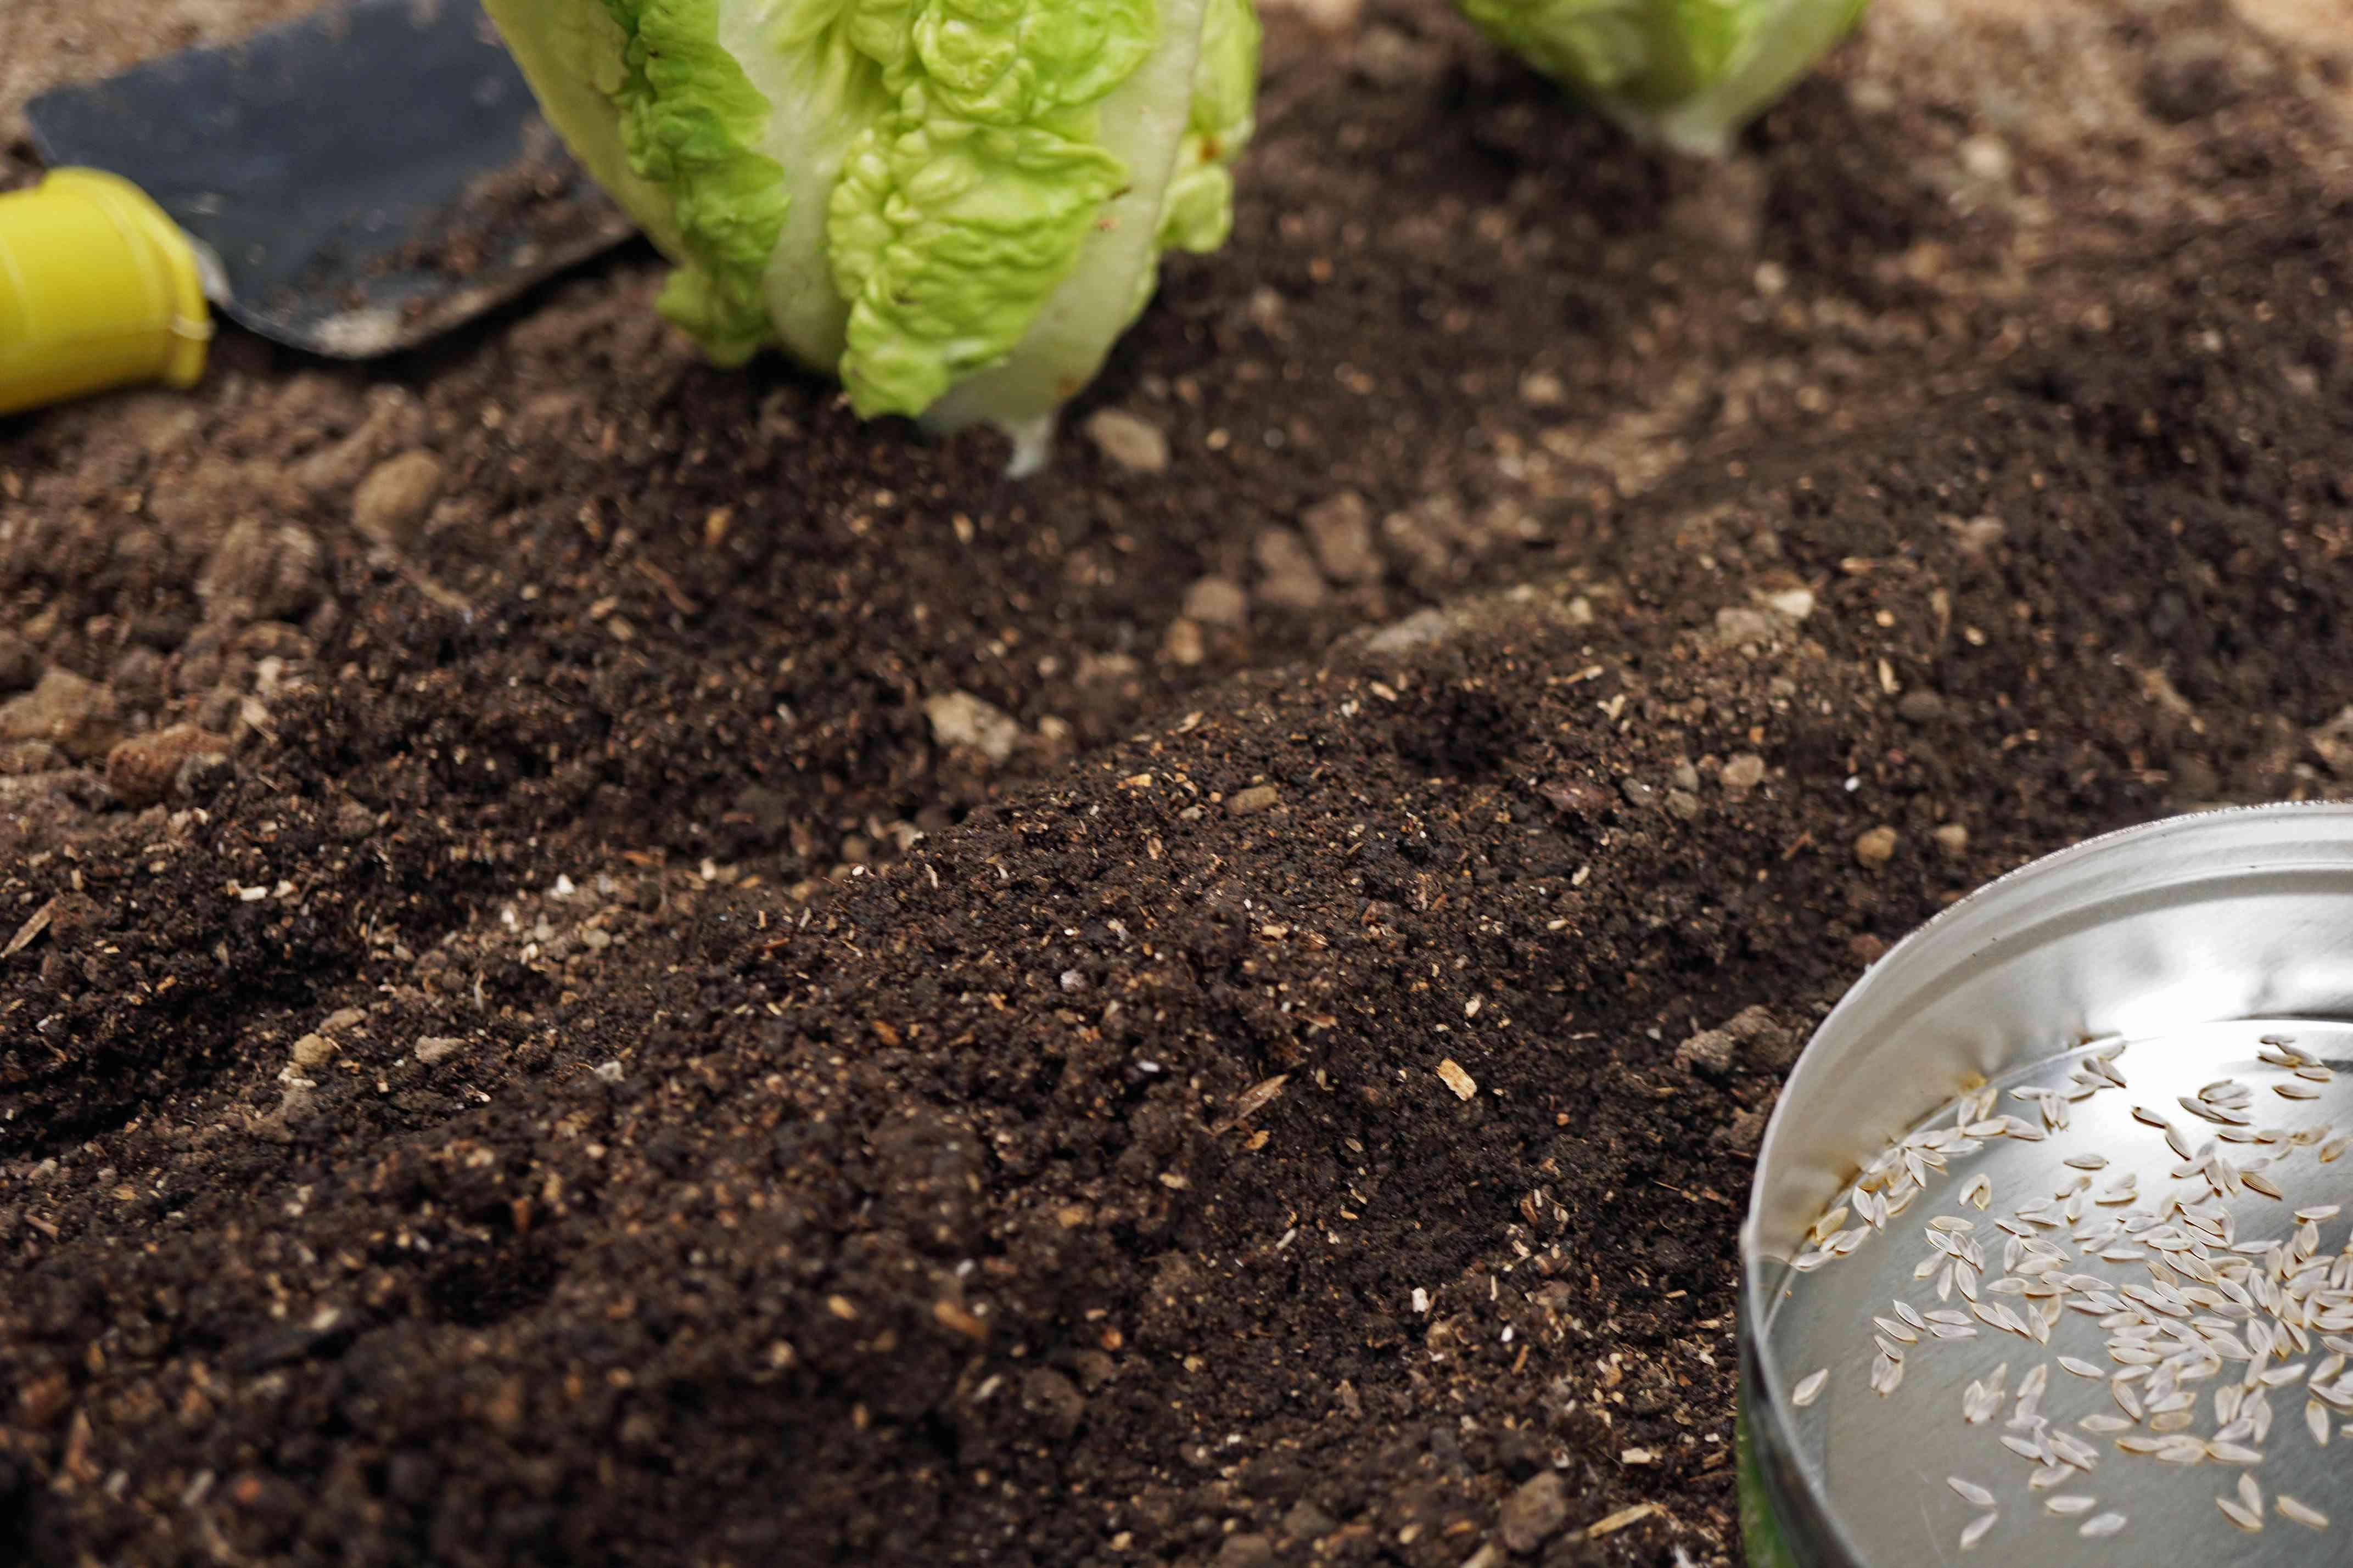 loose leaf lettuce seeds and dirt